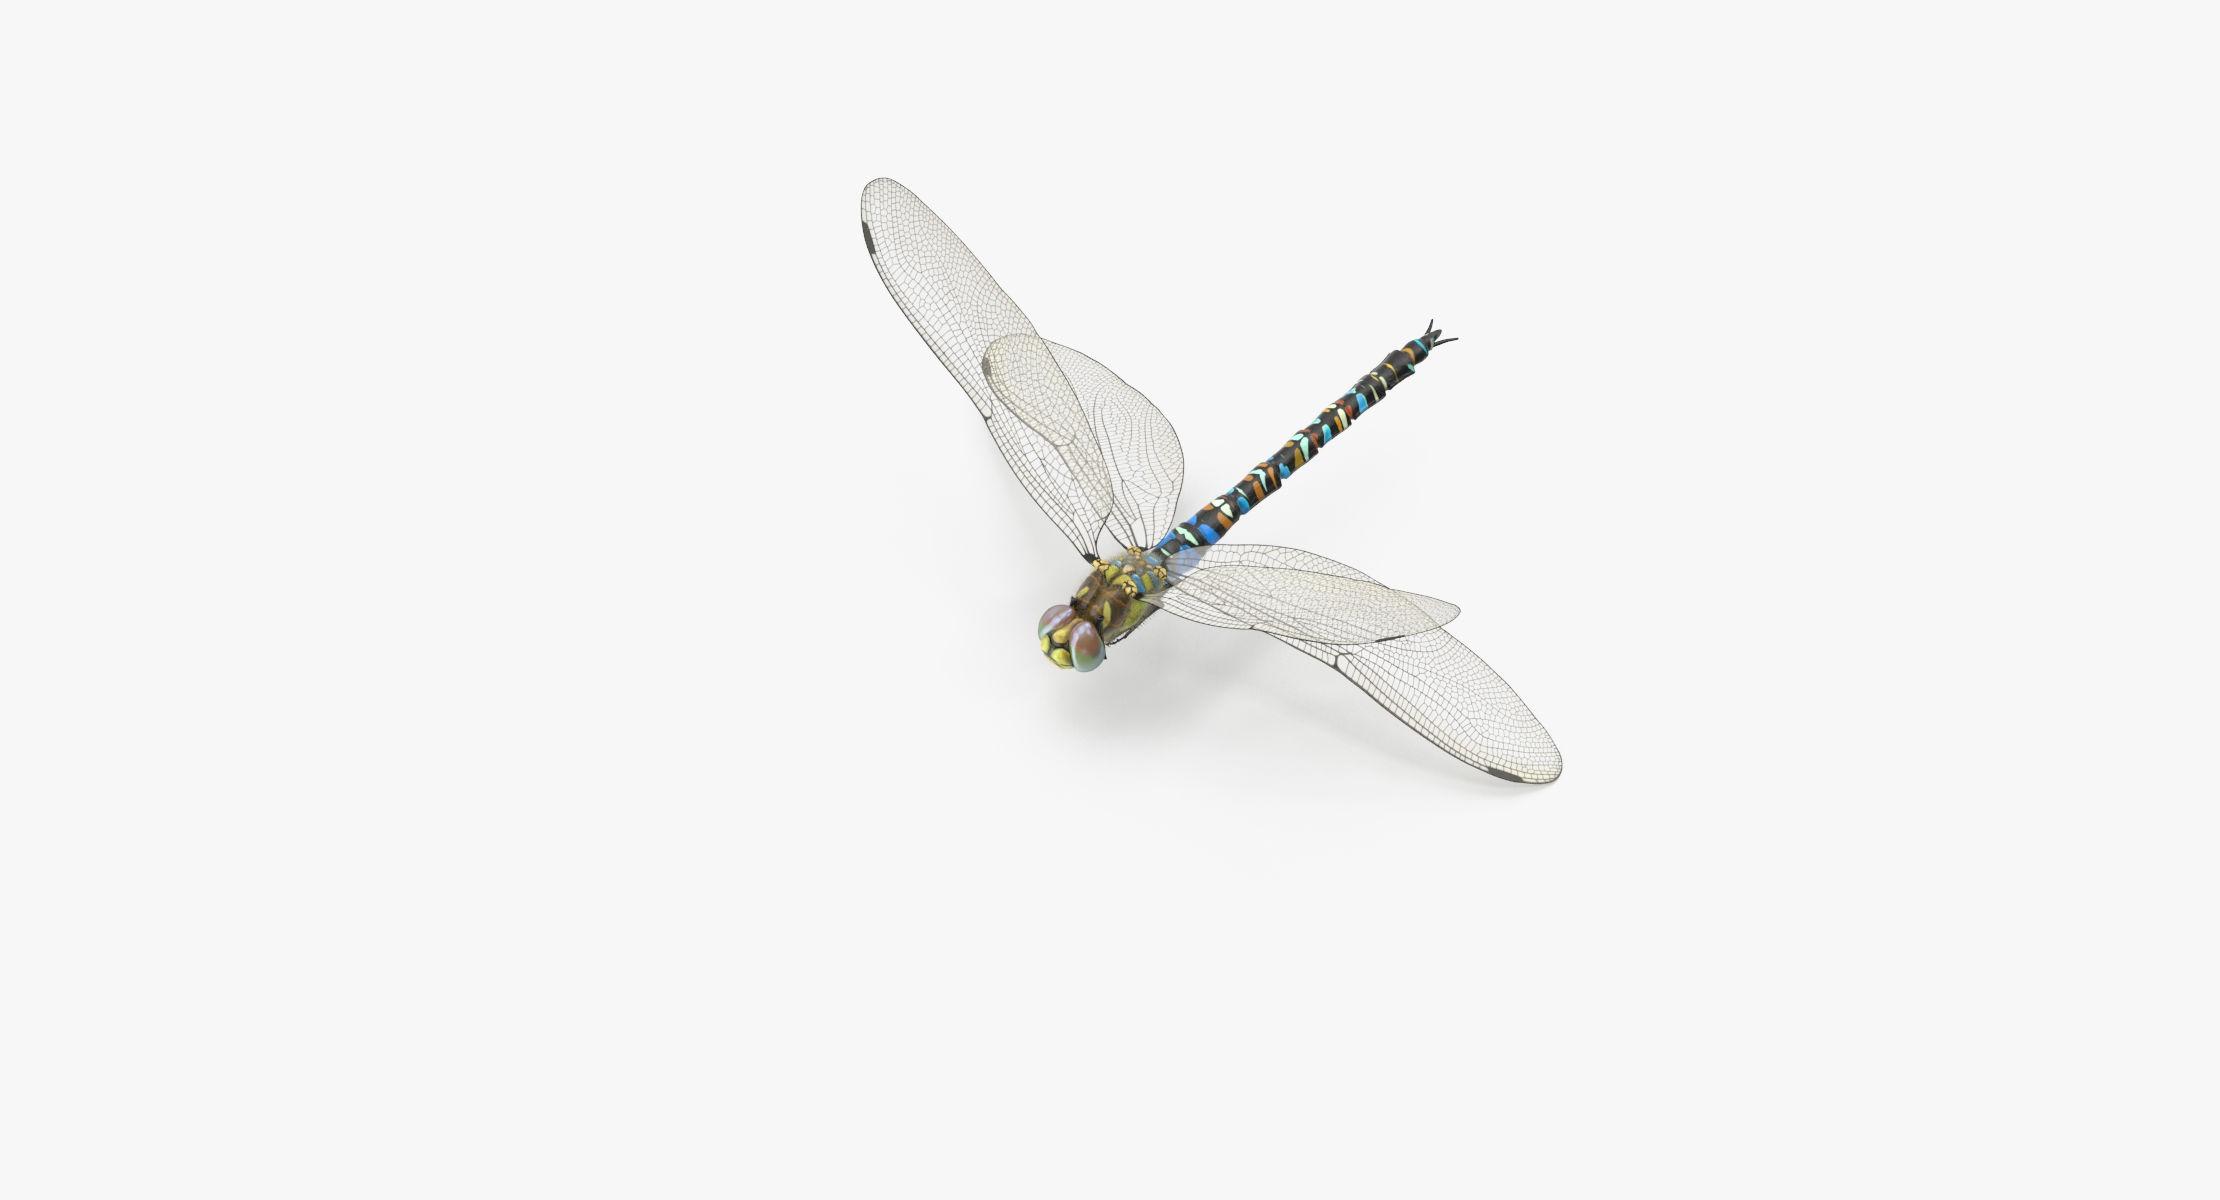 Dragonfly Pose 02 - reel 1